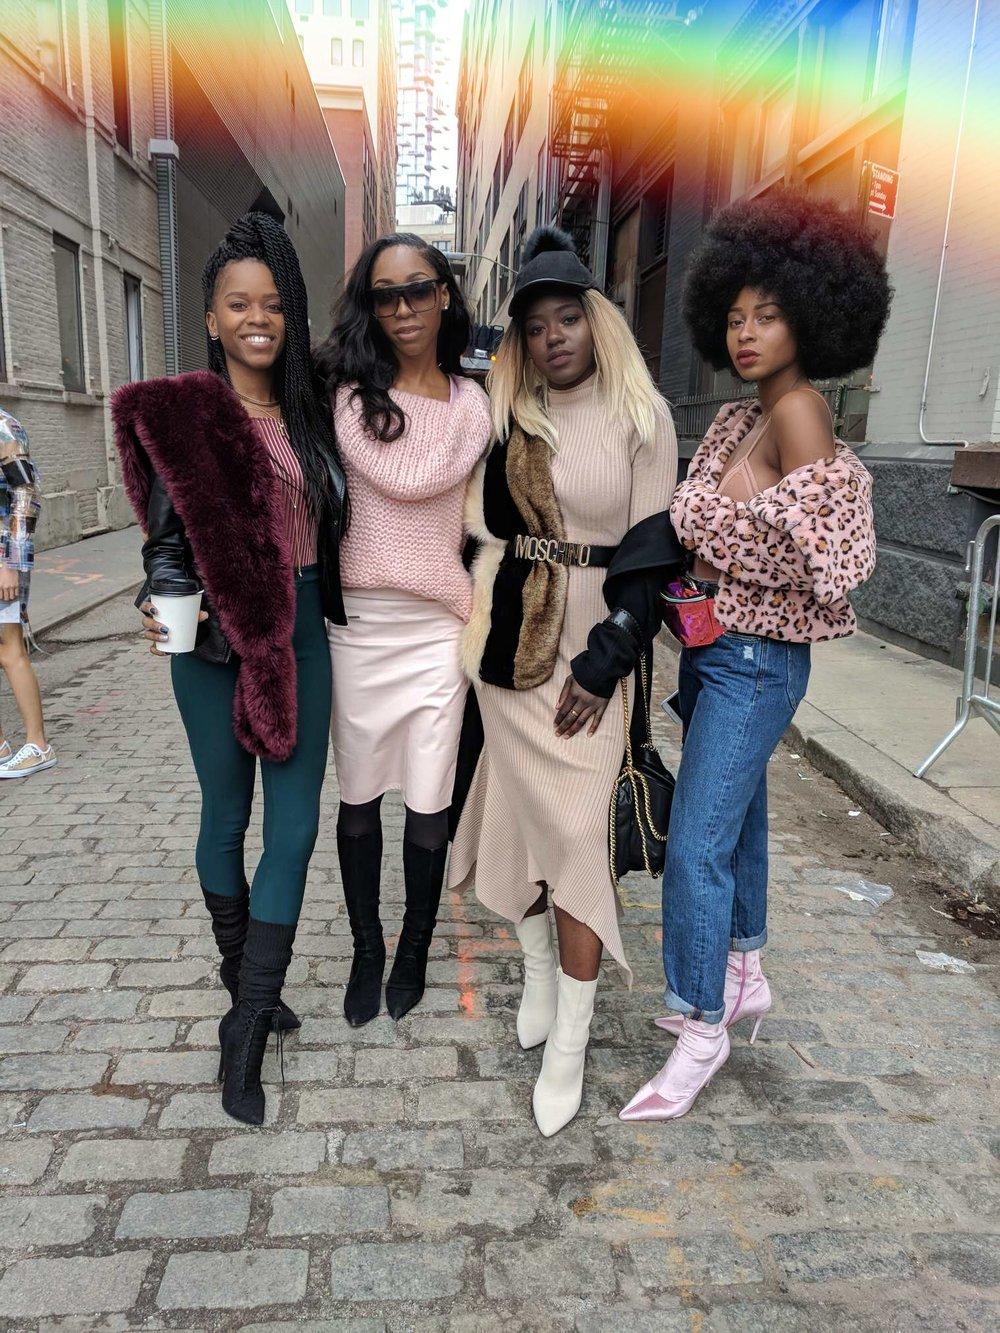 Left to Right: Serée, Chinyere , Amanda, Oriane